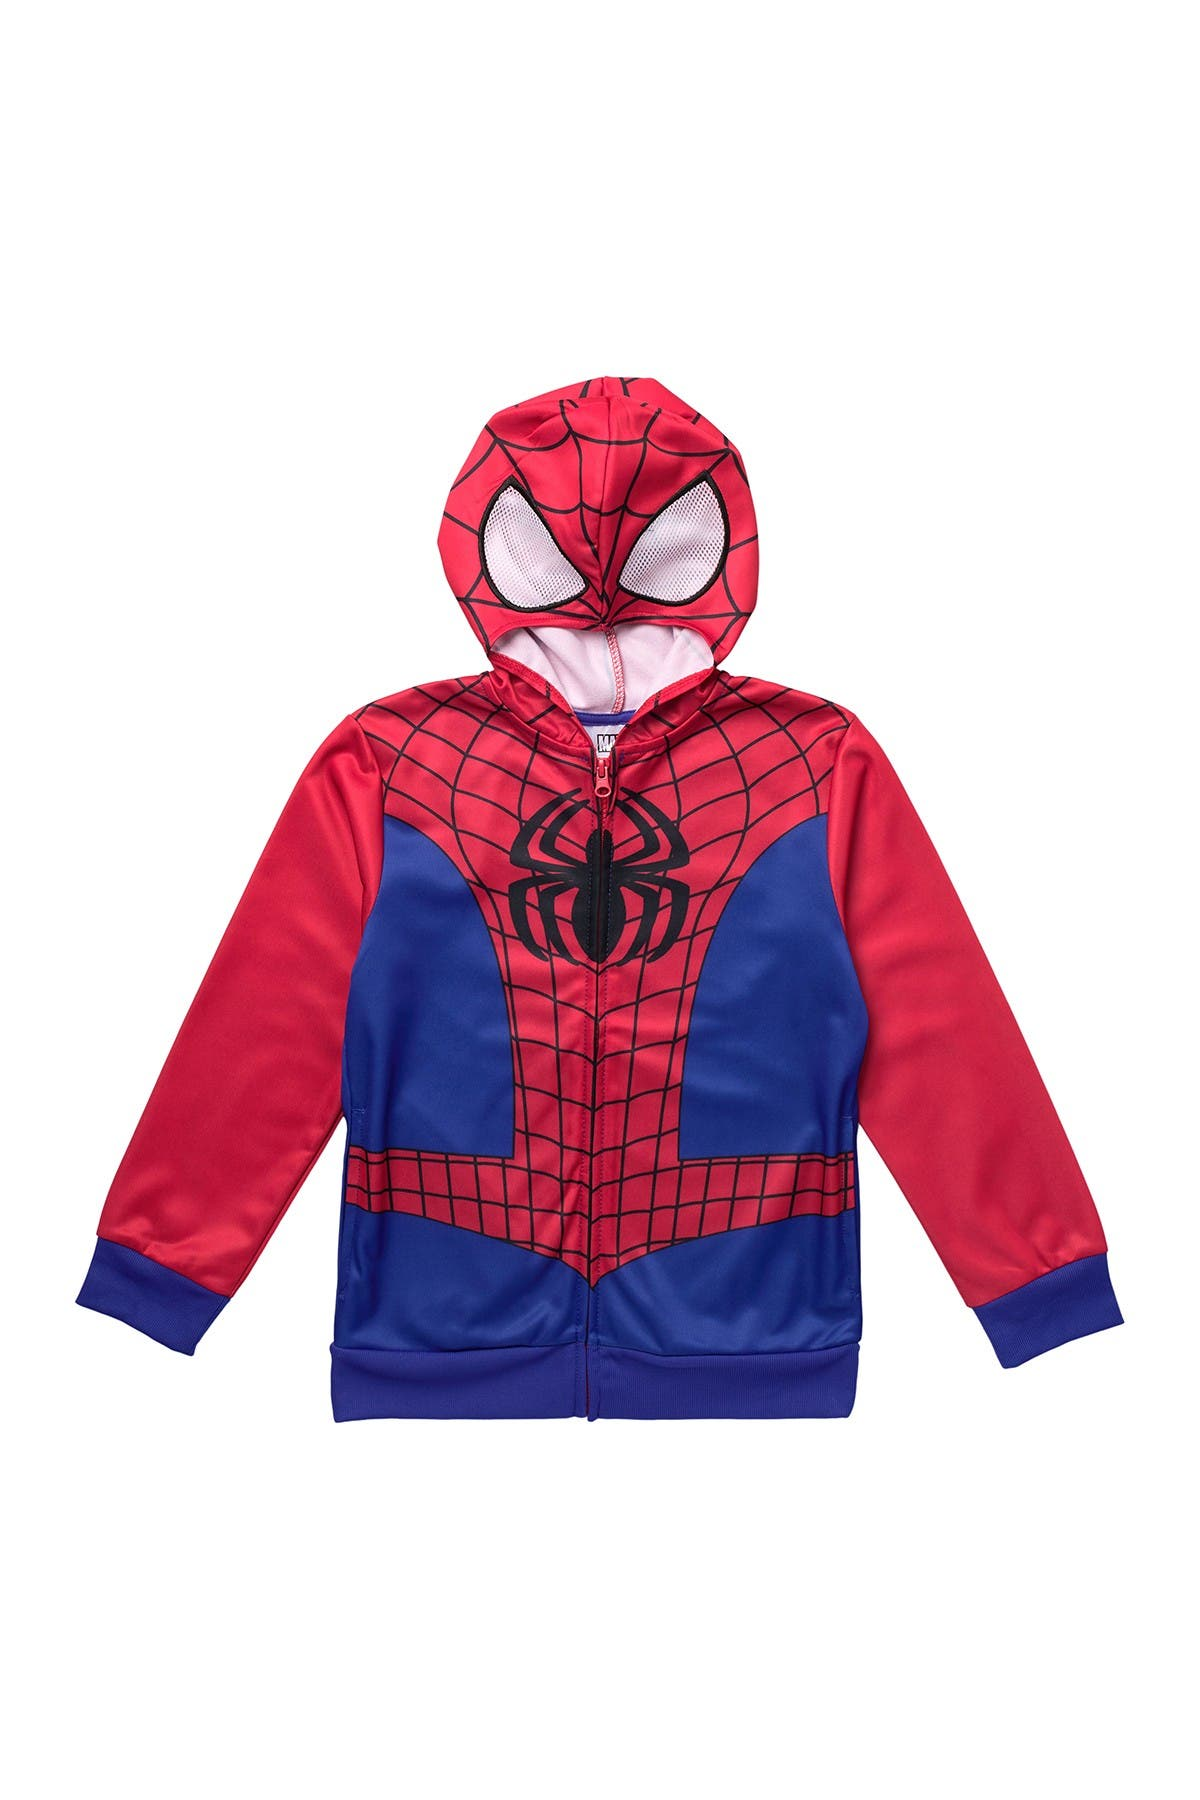 Image of JEM Spider-Man Costume Hoodie